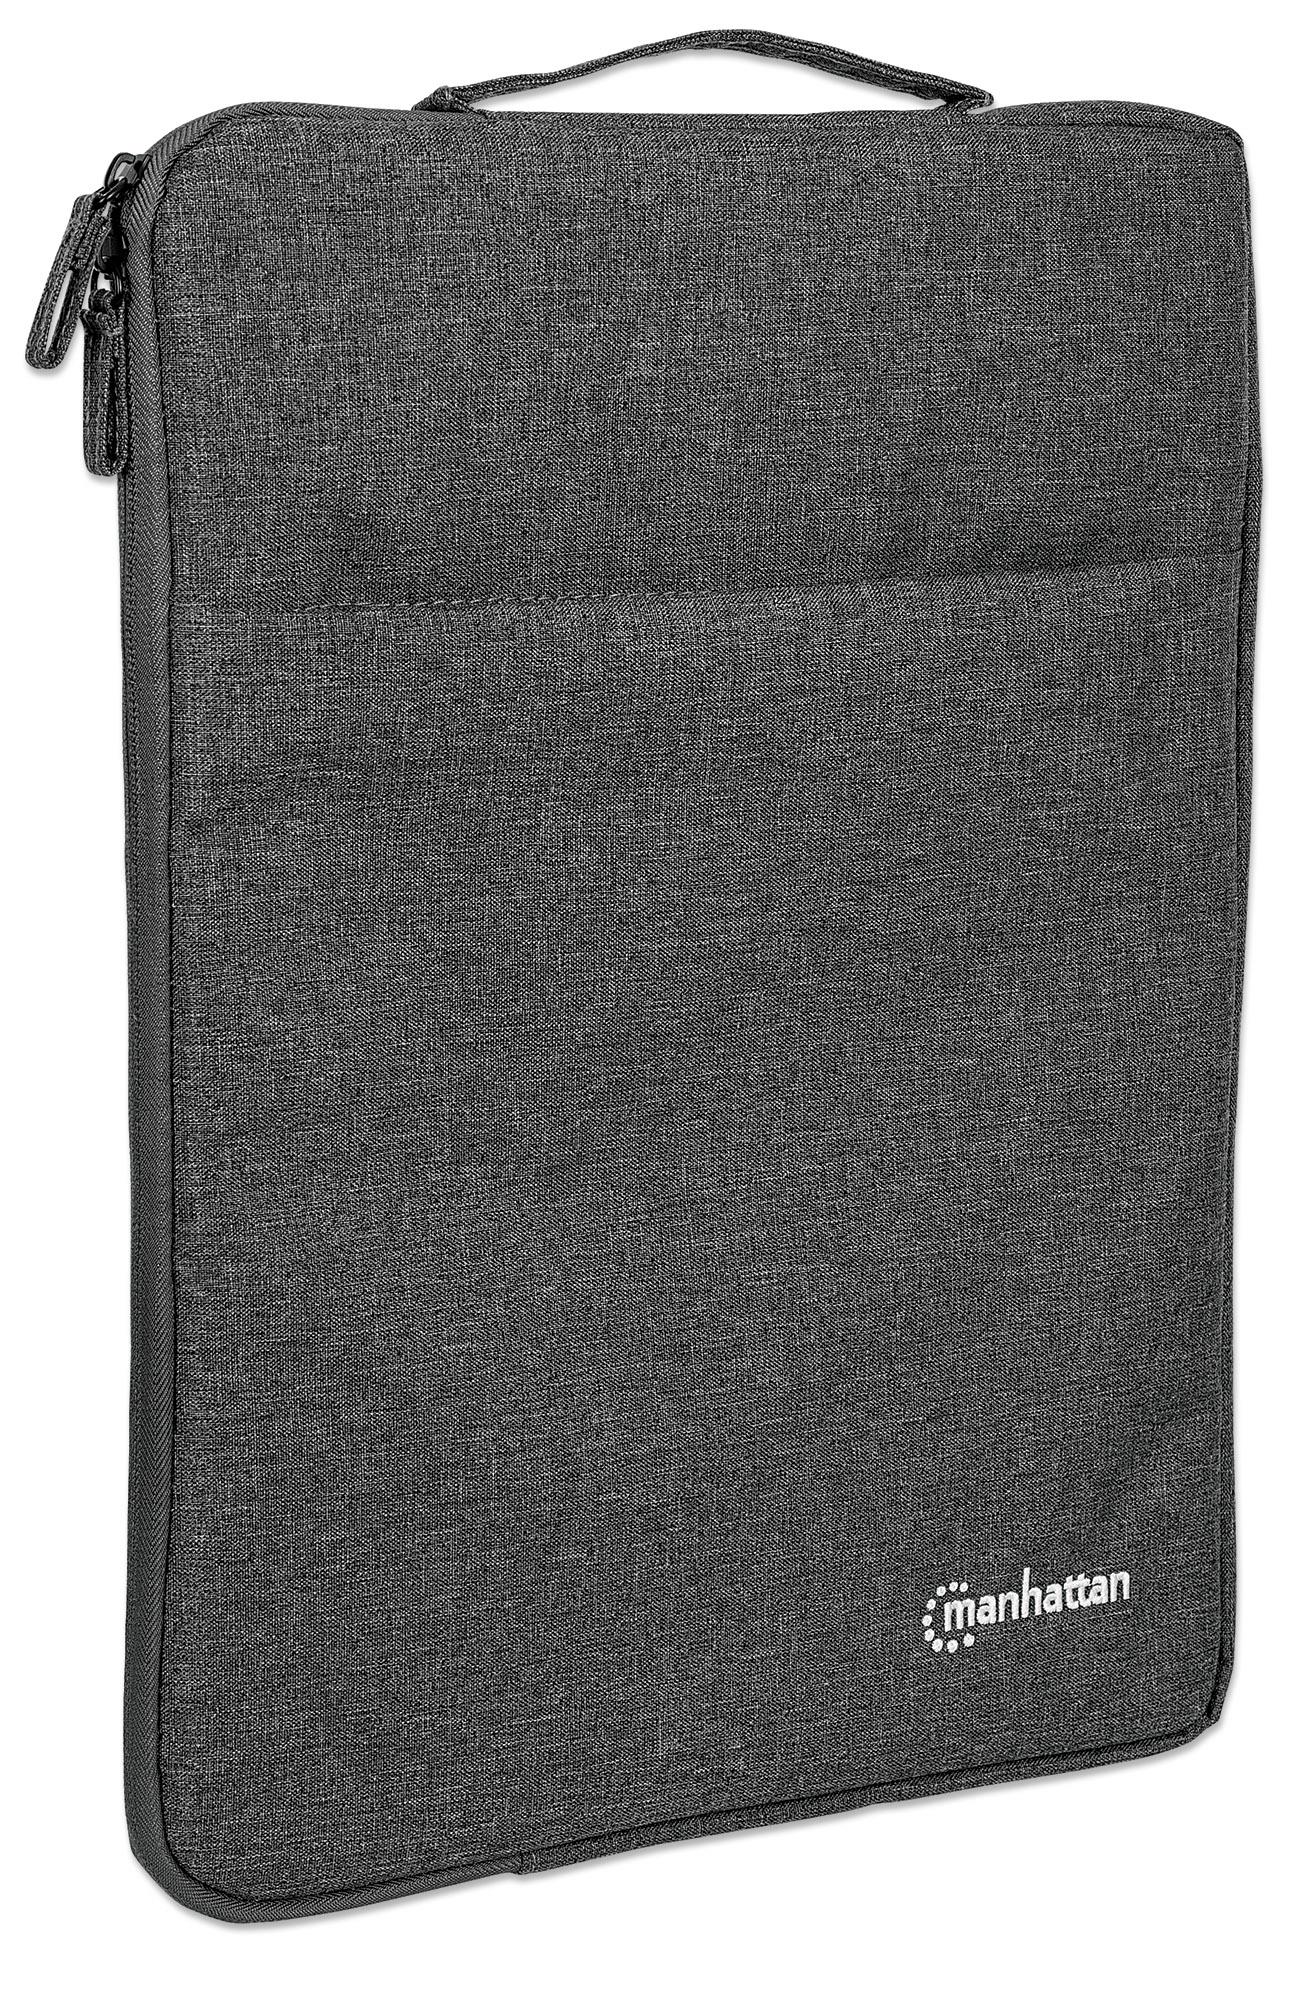 Seattle Notebook Sleeve 15.6